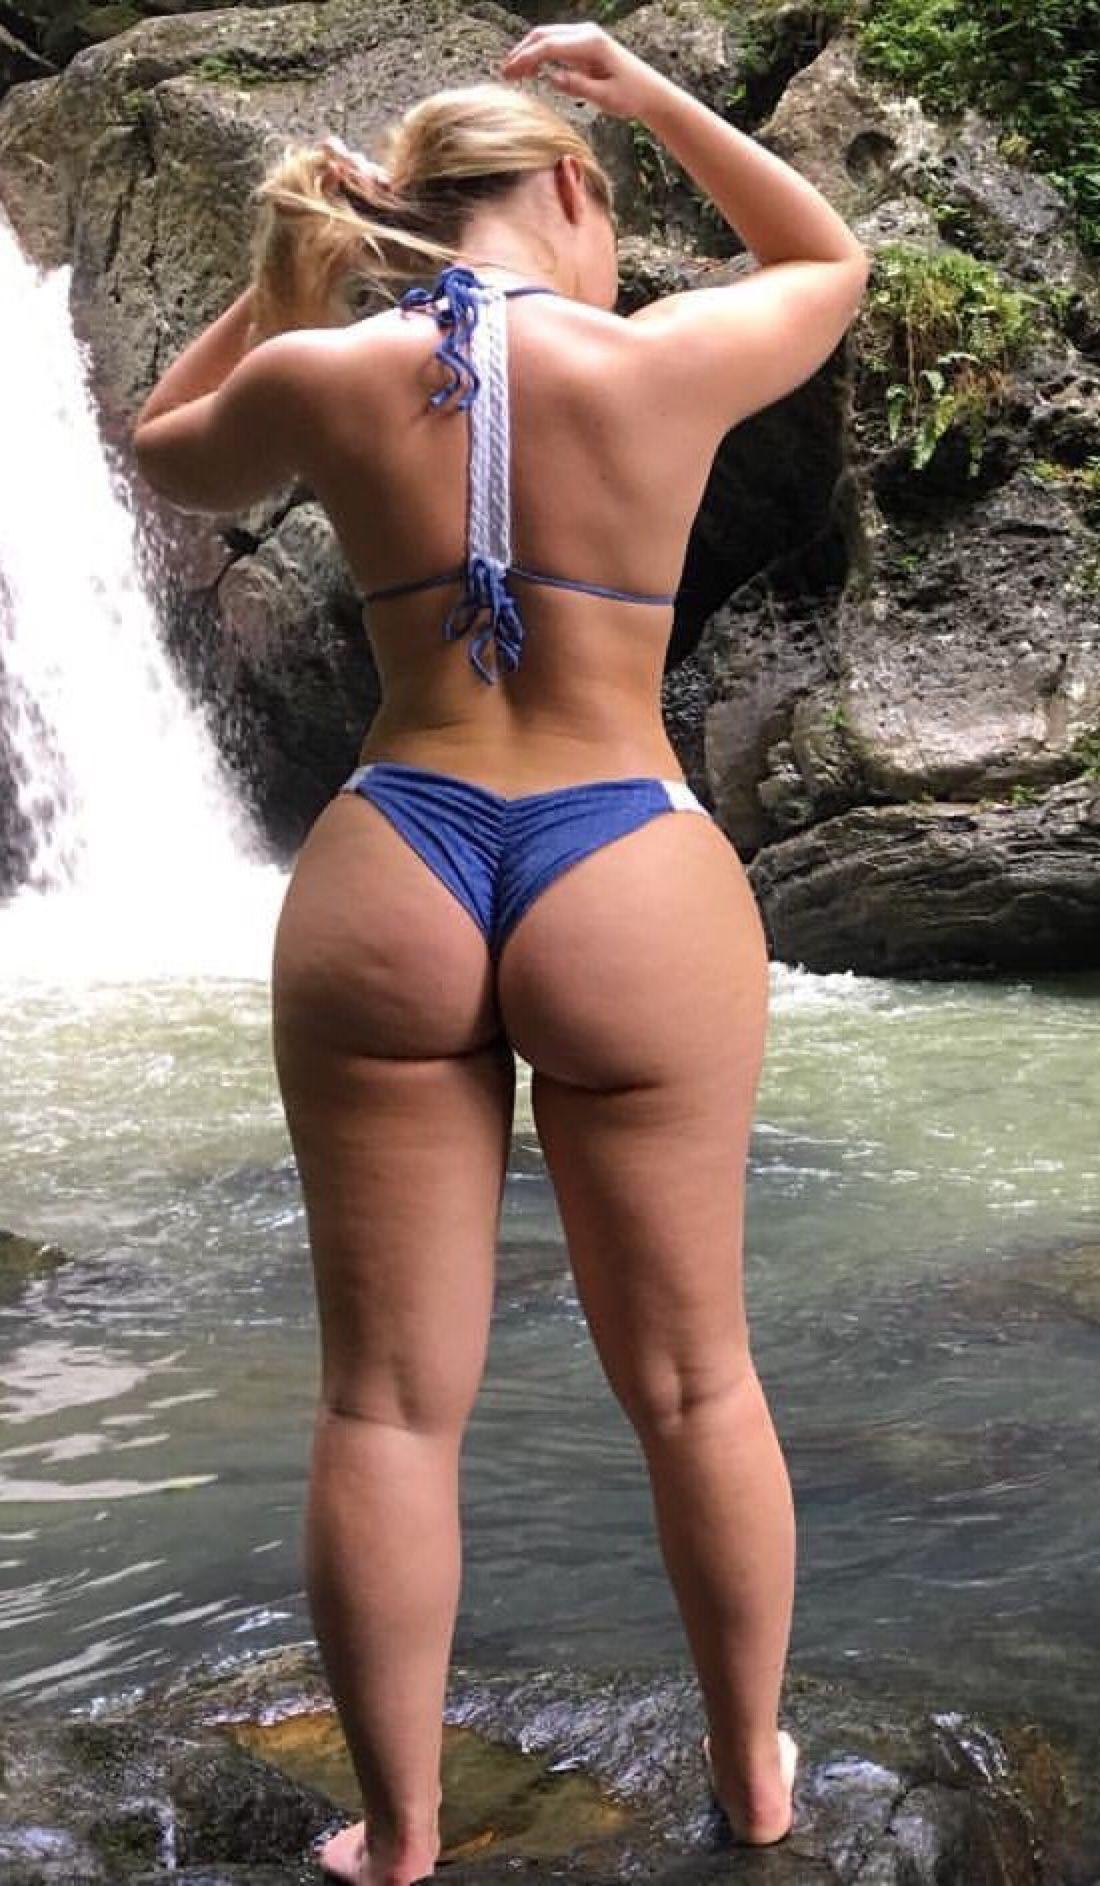 Unblocked arcade boobs butt or shoulder